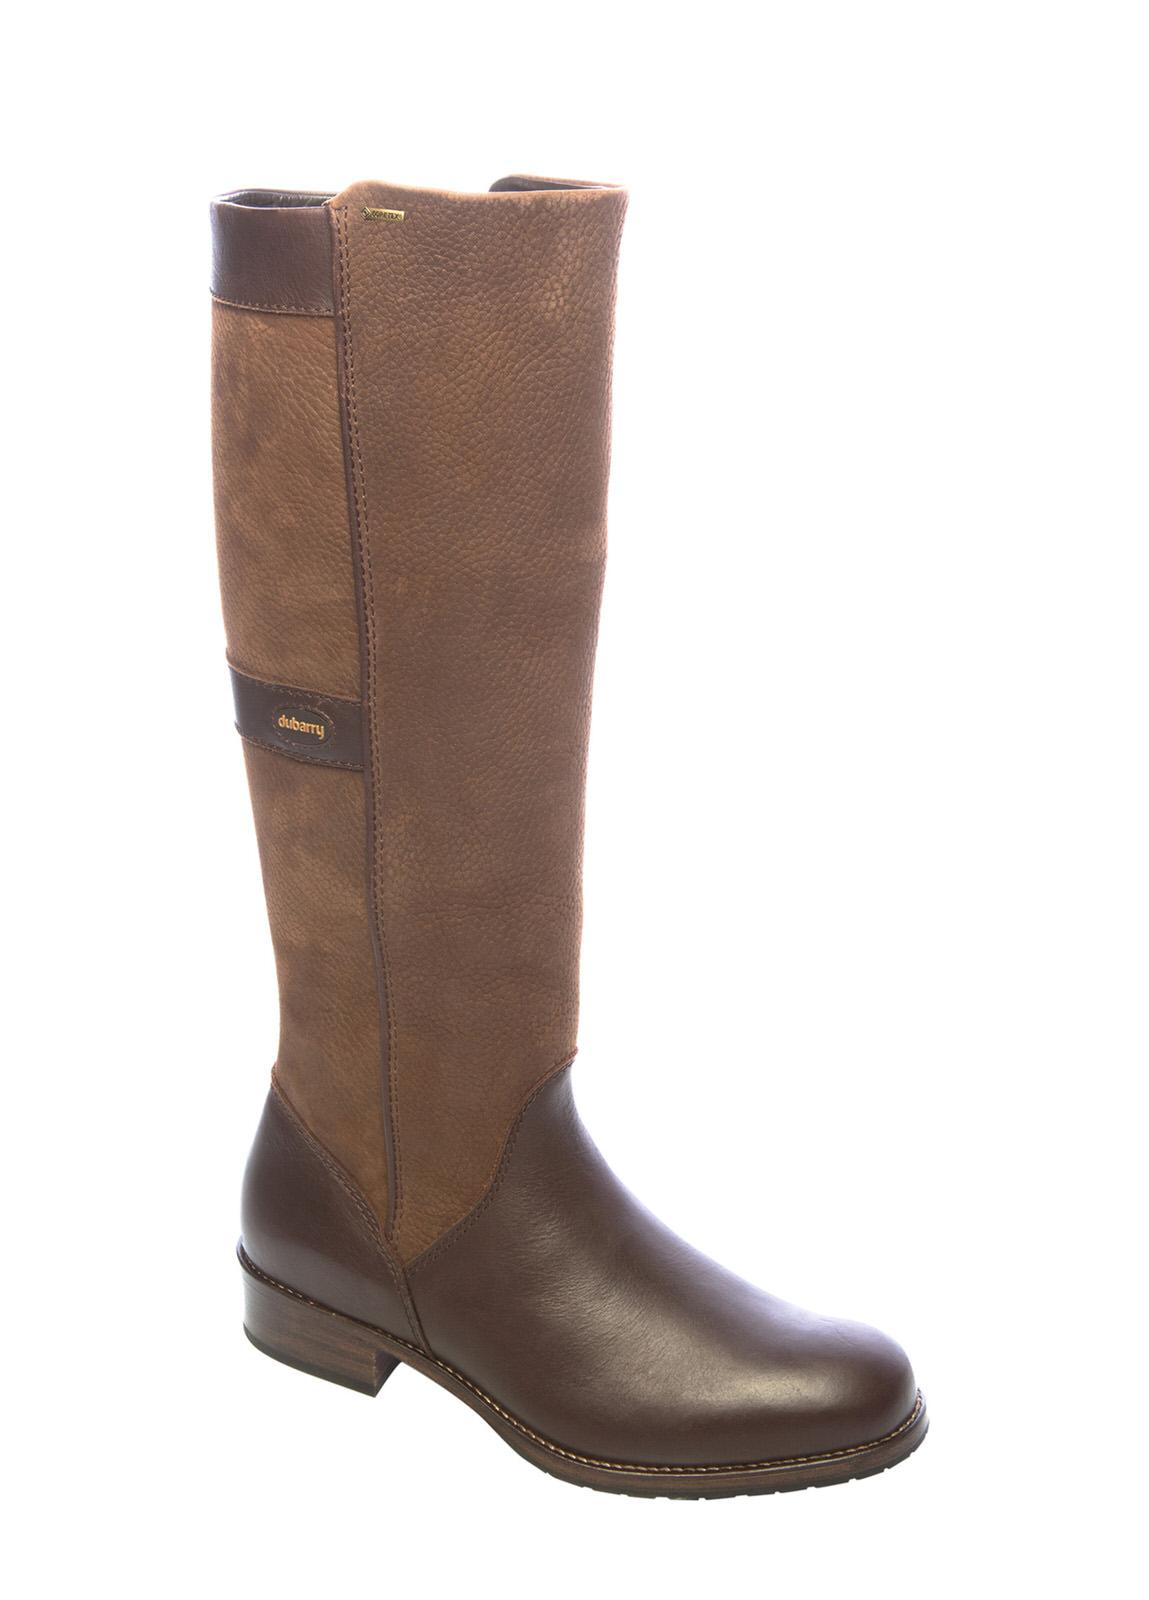 Dubarry_ Fermoy Boot - Walnut_Image_1